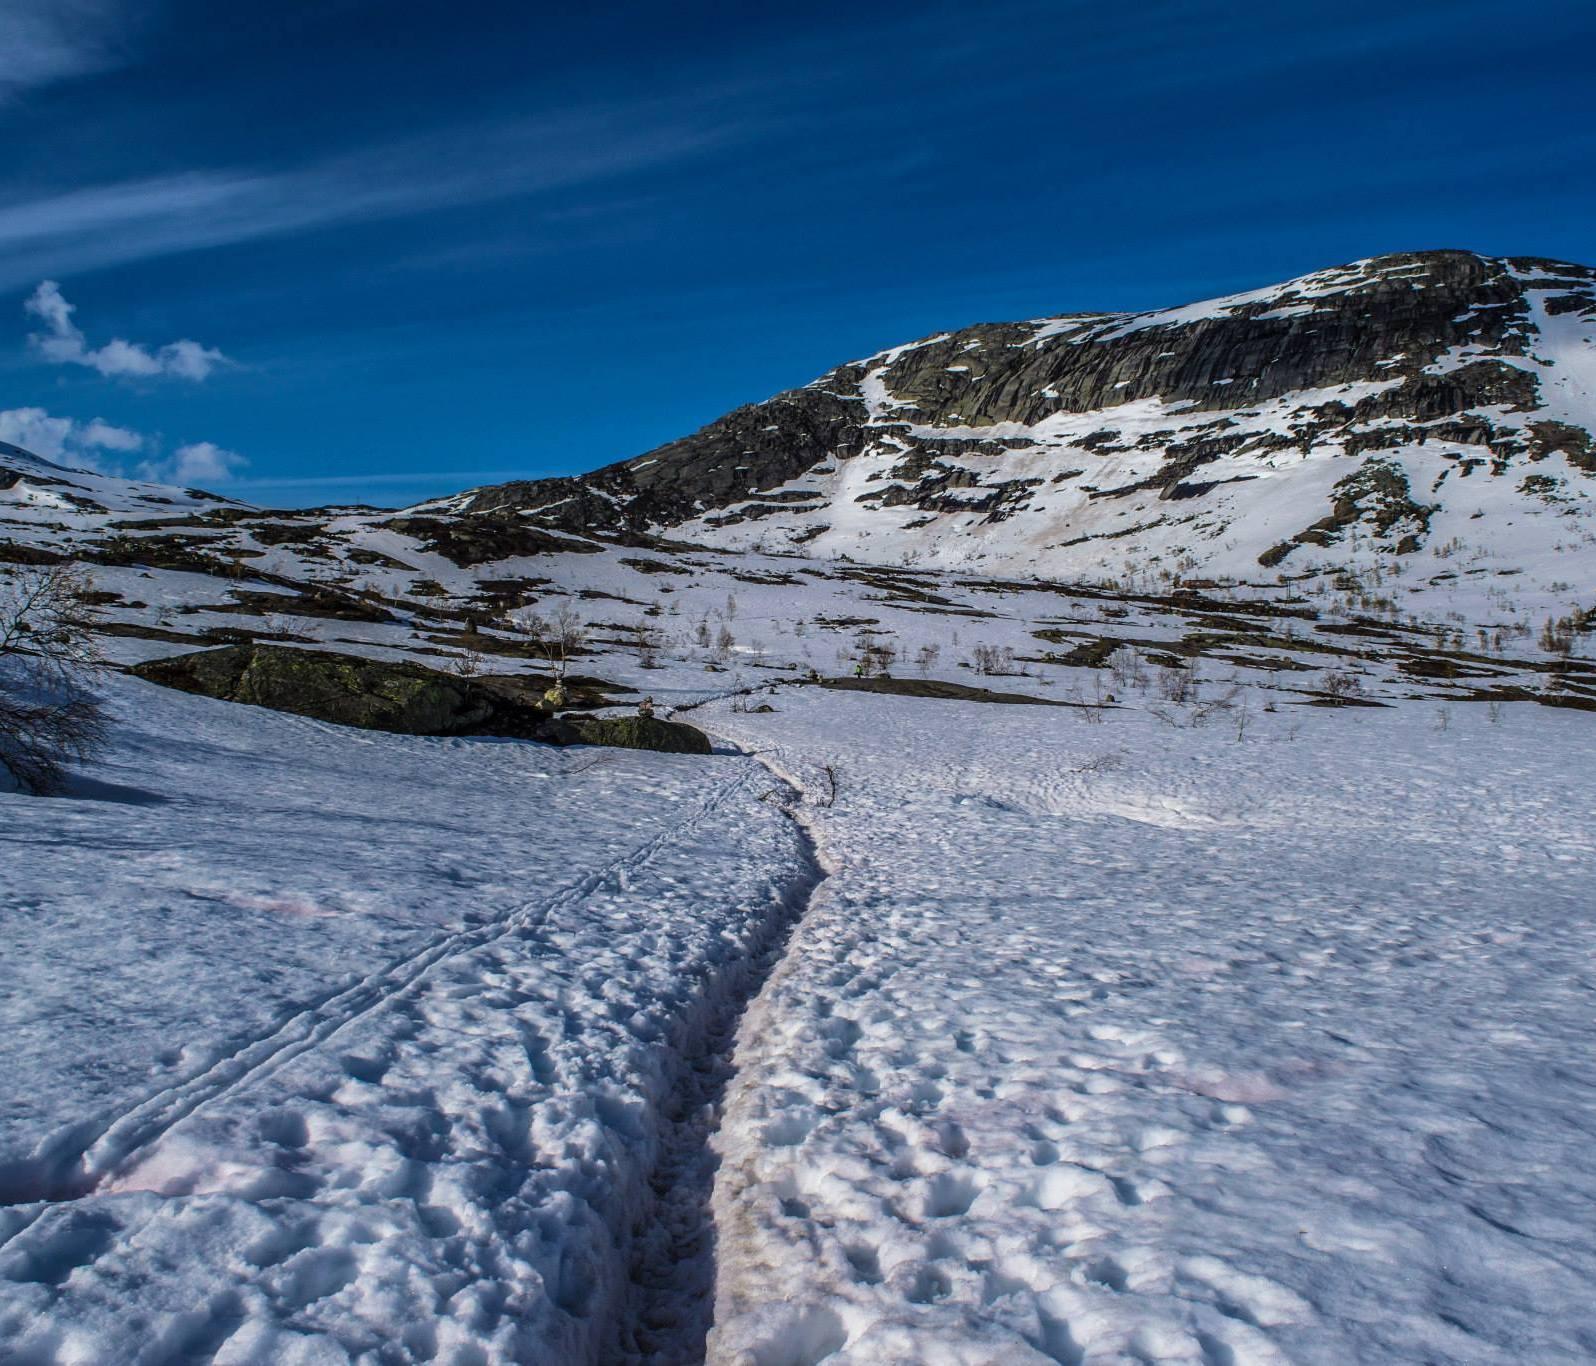 The trail through the Maglitopp.